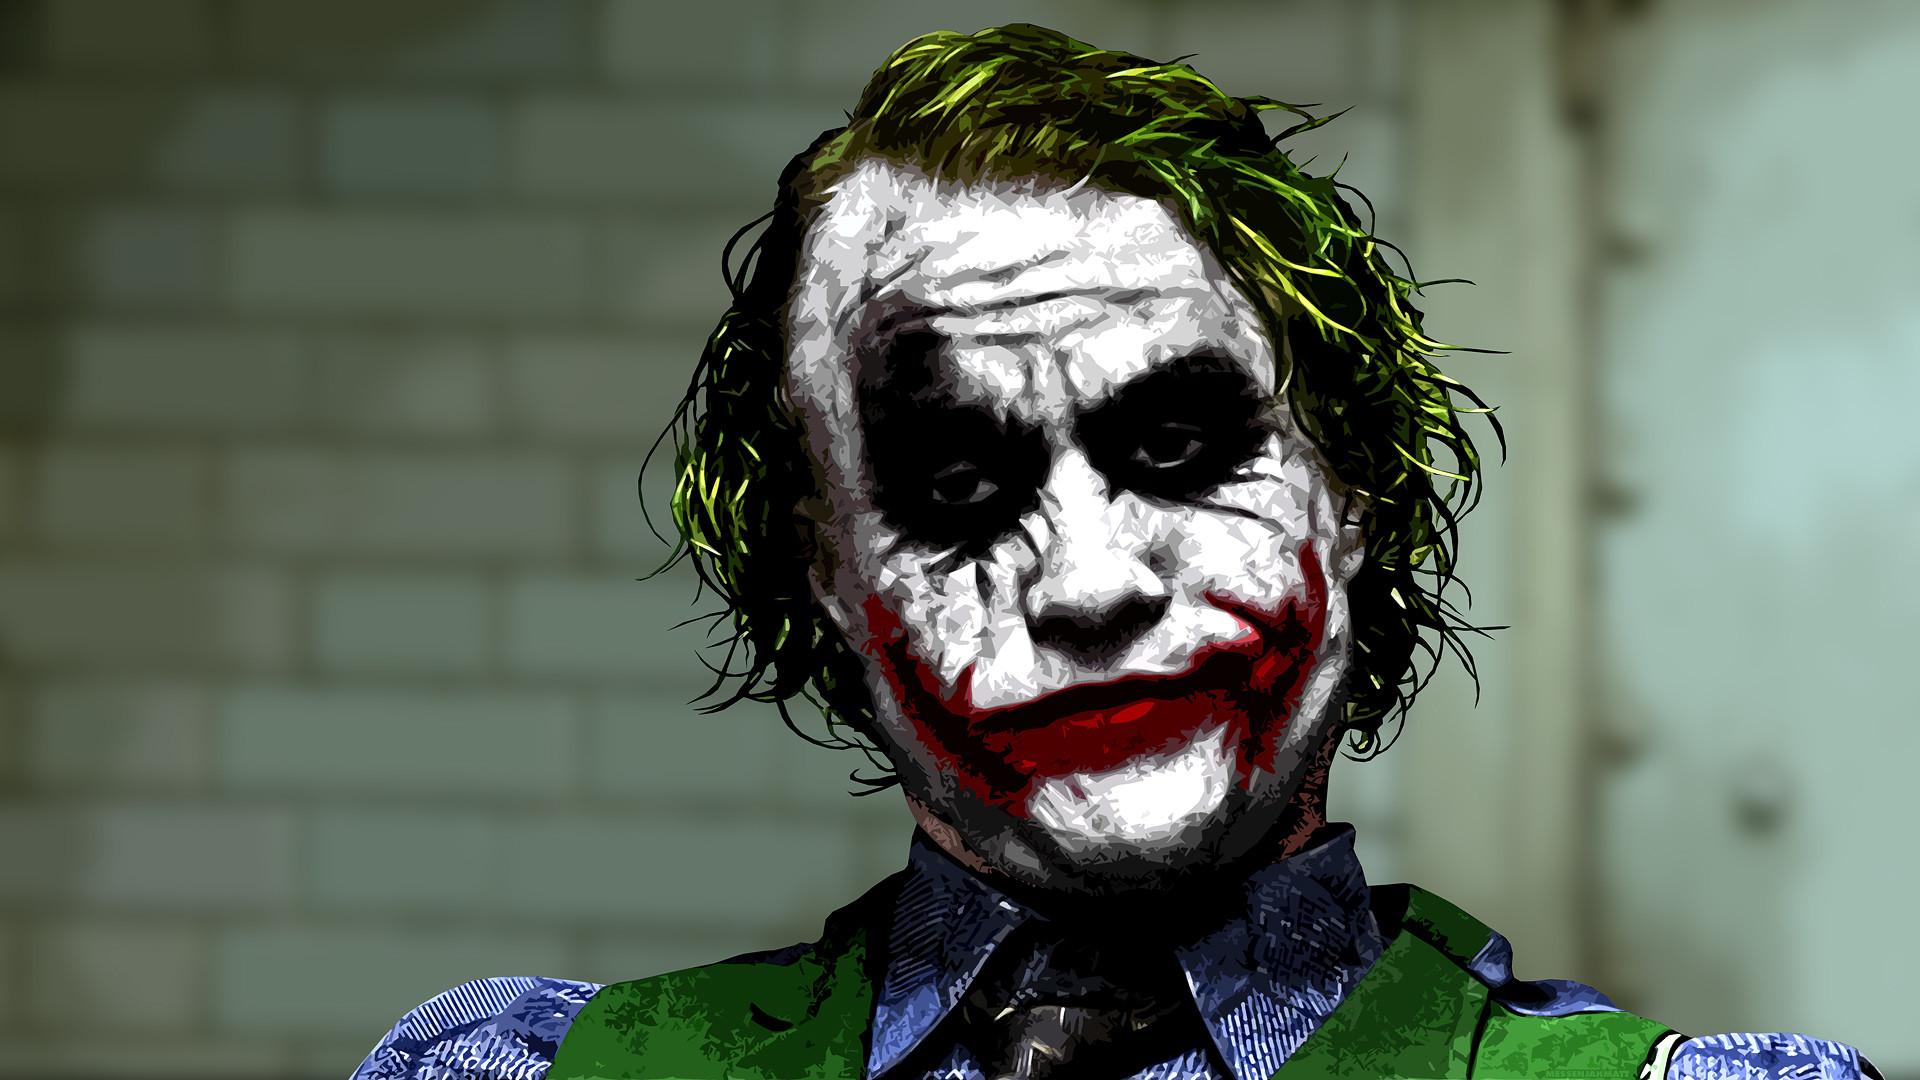 The Joker Wallpapers The Joker Wide Screen Wallpaper